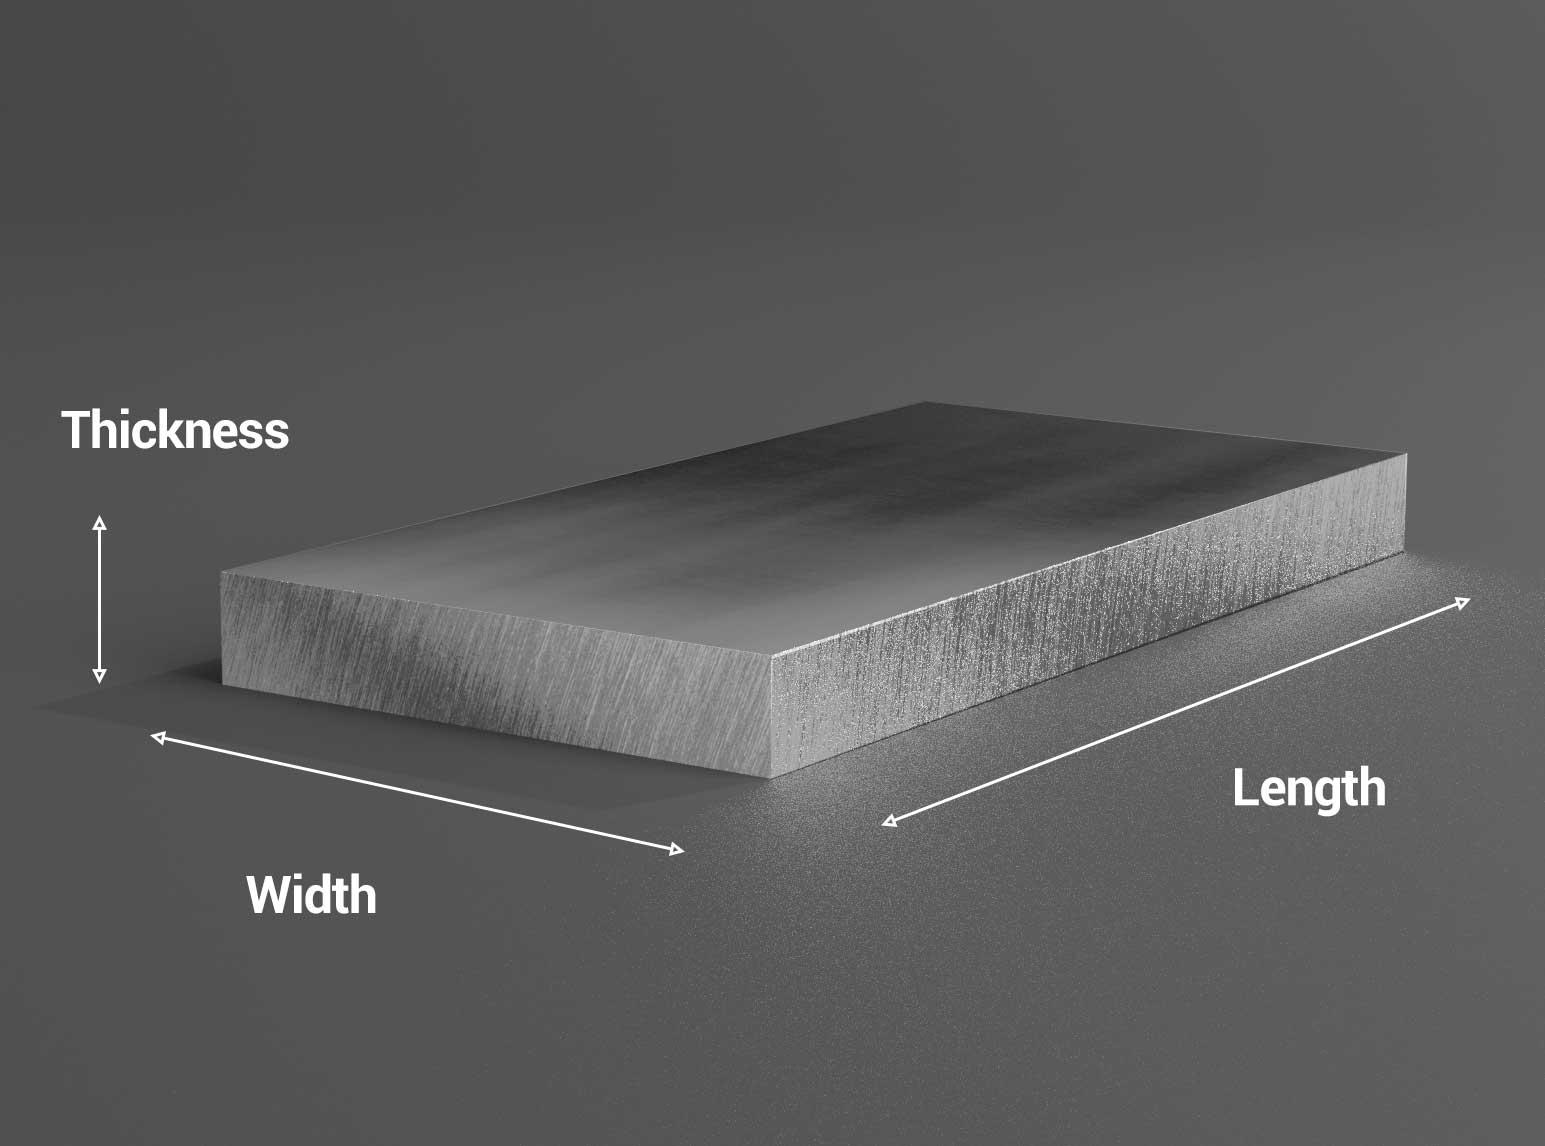 Weight_calculation_formula_aluminium_rolled_plate